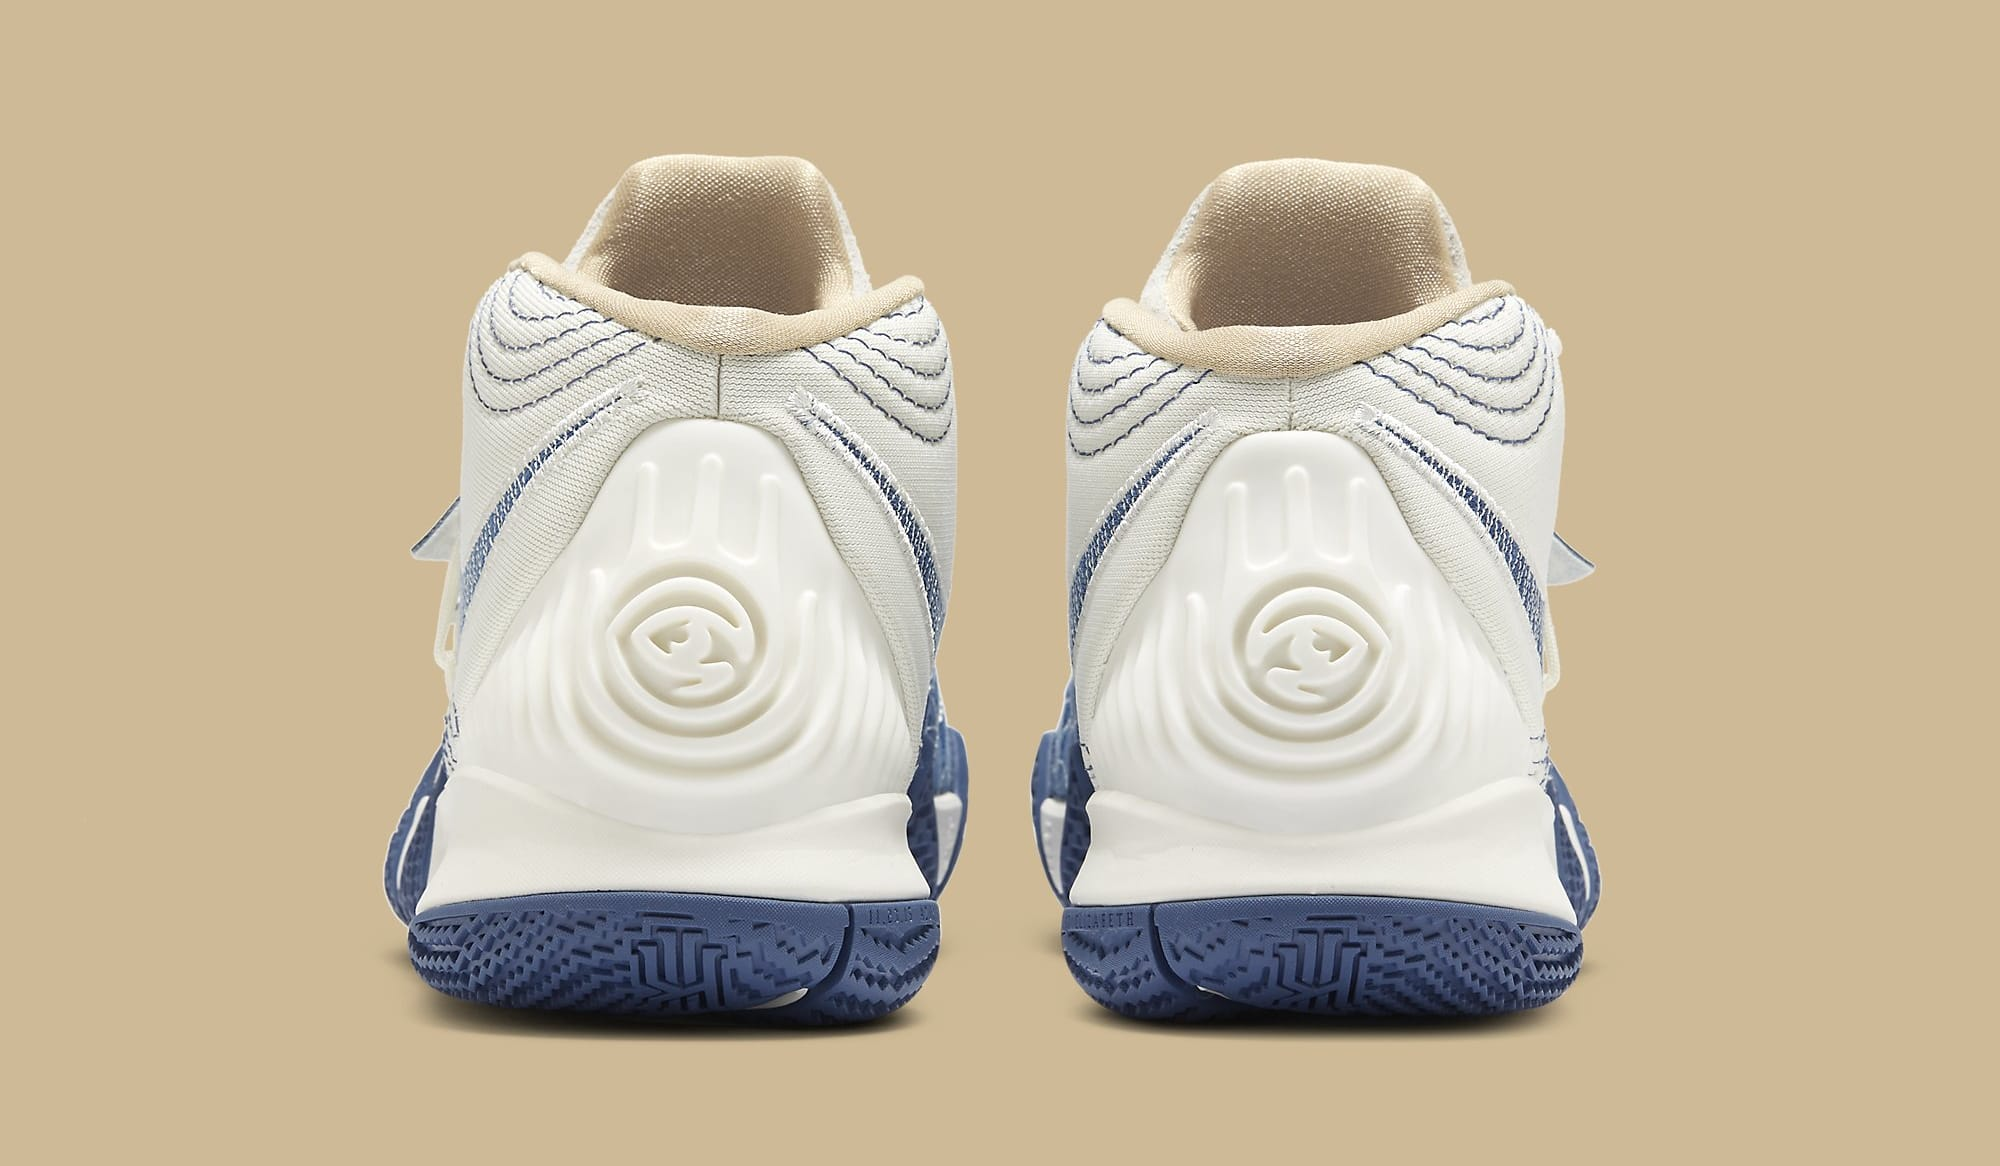 Nike Kyrie S2 Kybrid 'Sashiko' DA6806-100 Top